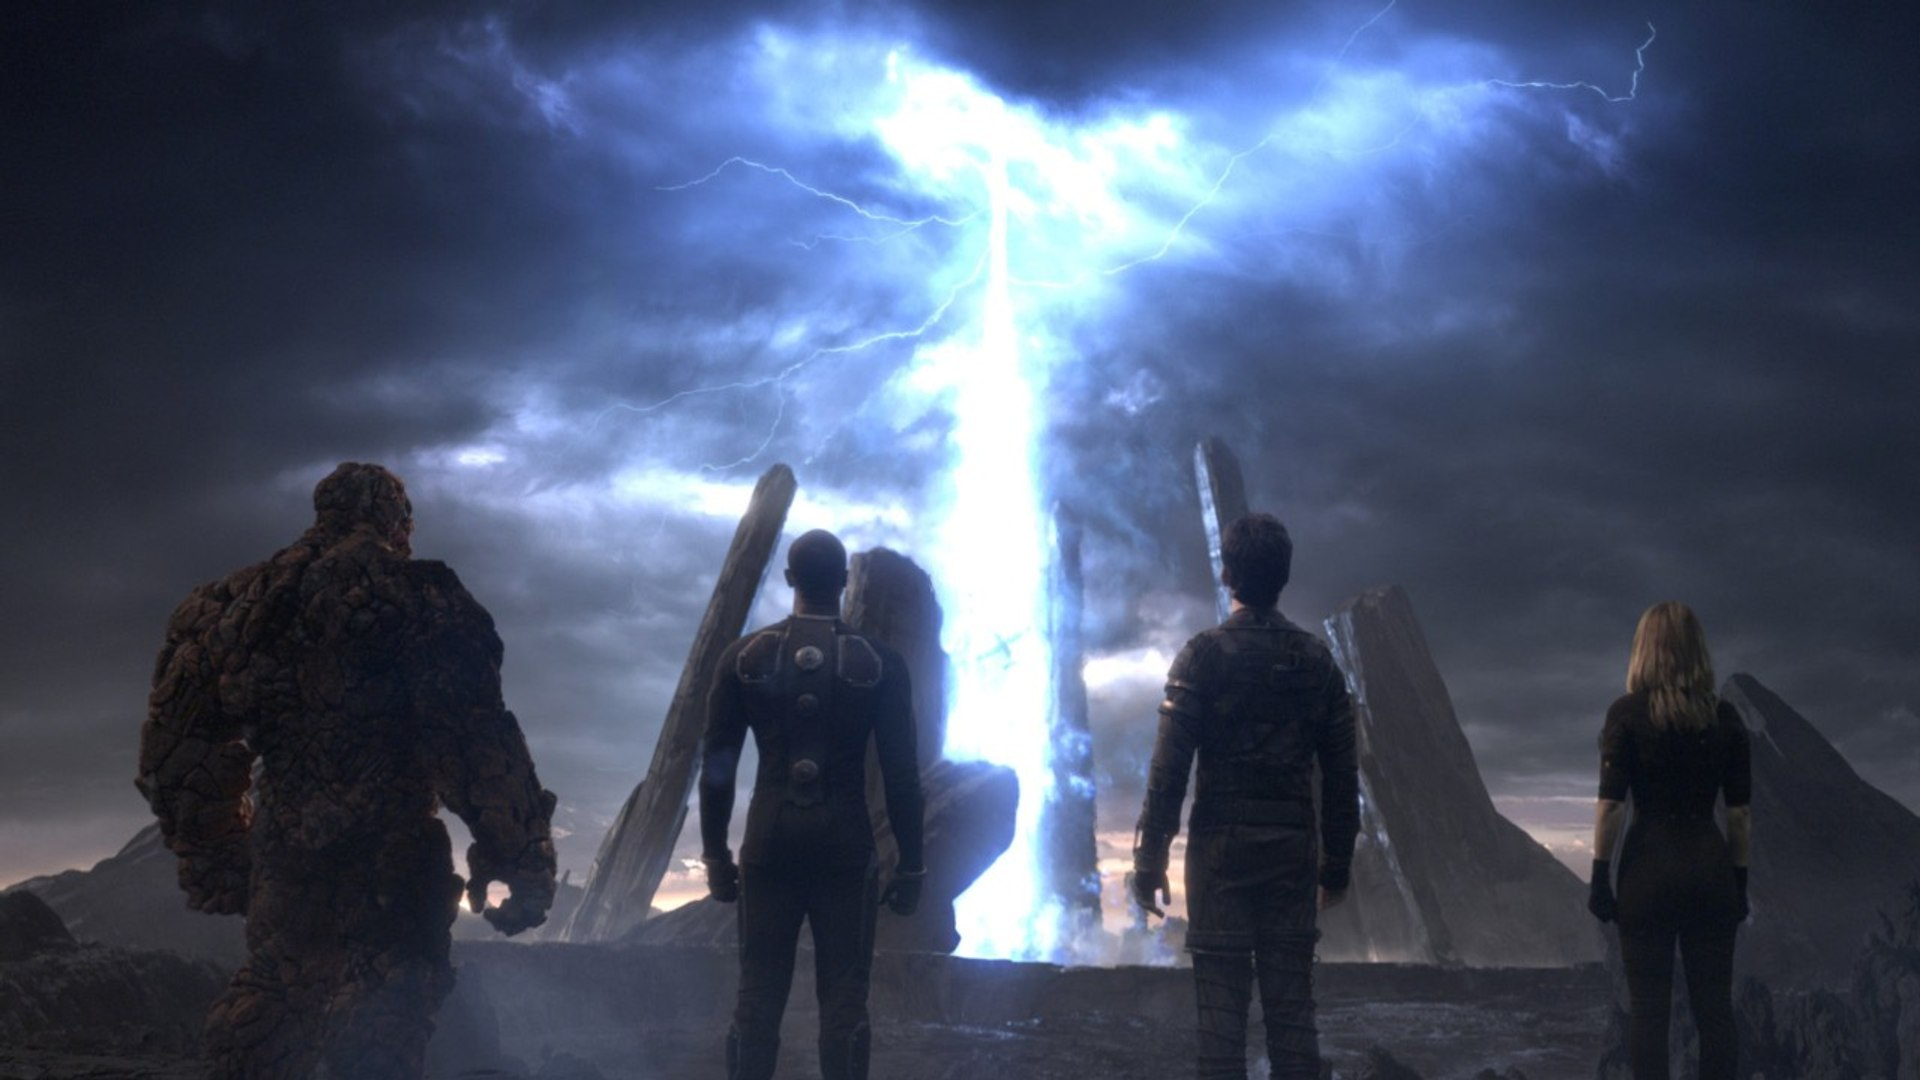 Stan Lee Confirms Marvel Studios Still Looking To Regain Rights From 20th Century Fox